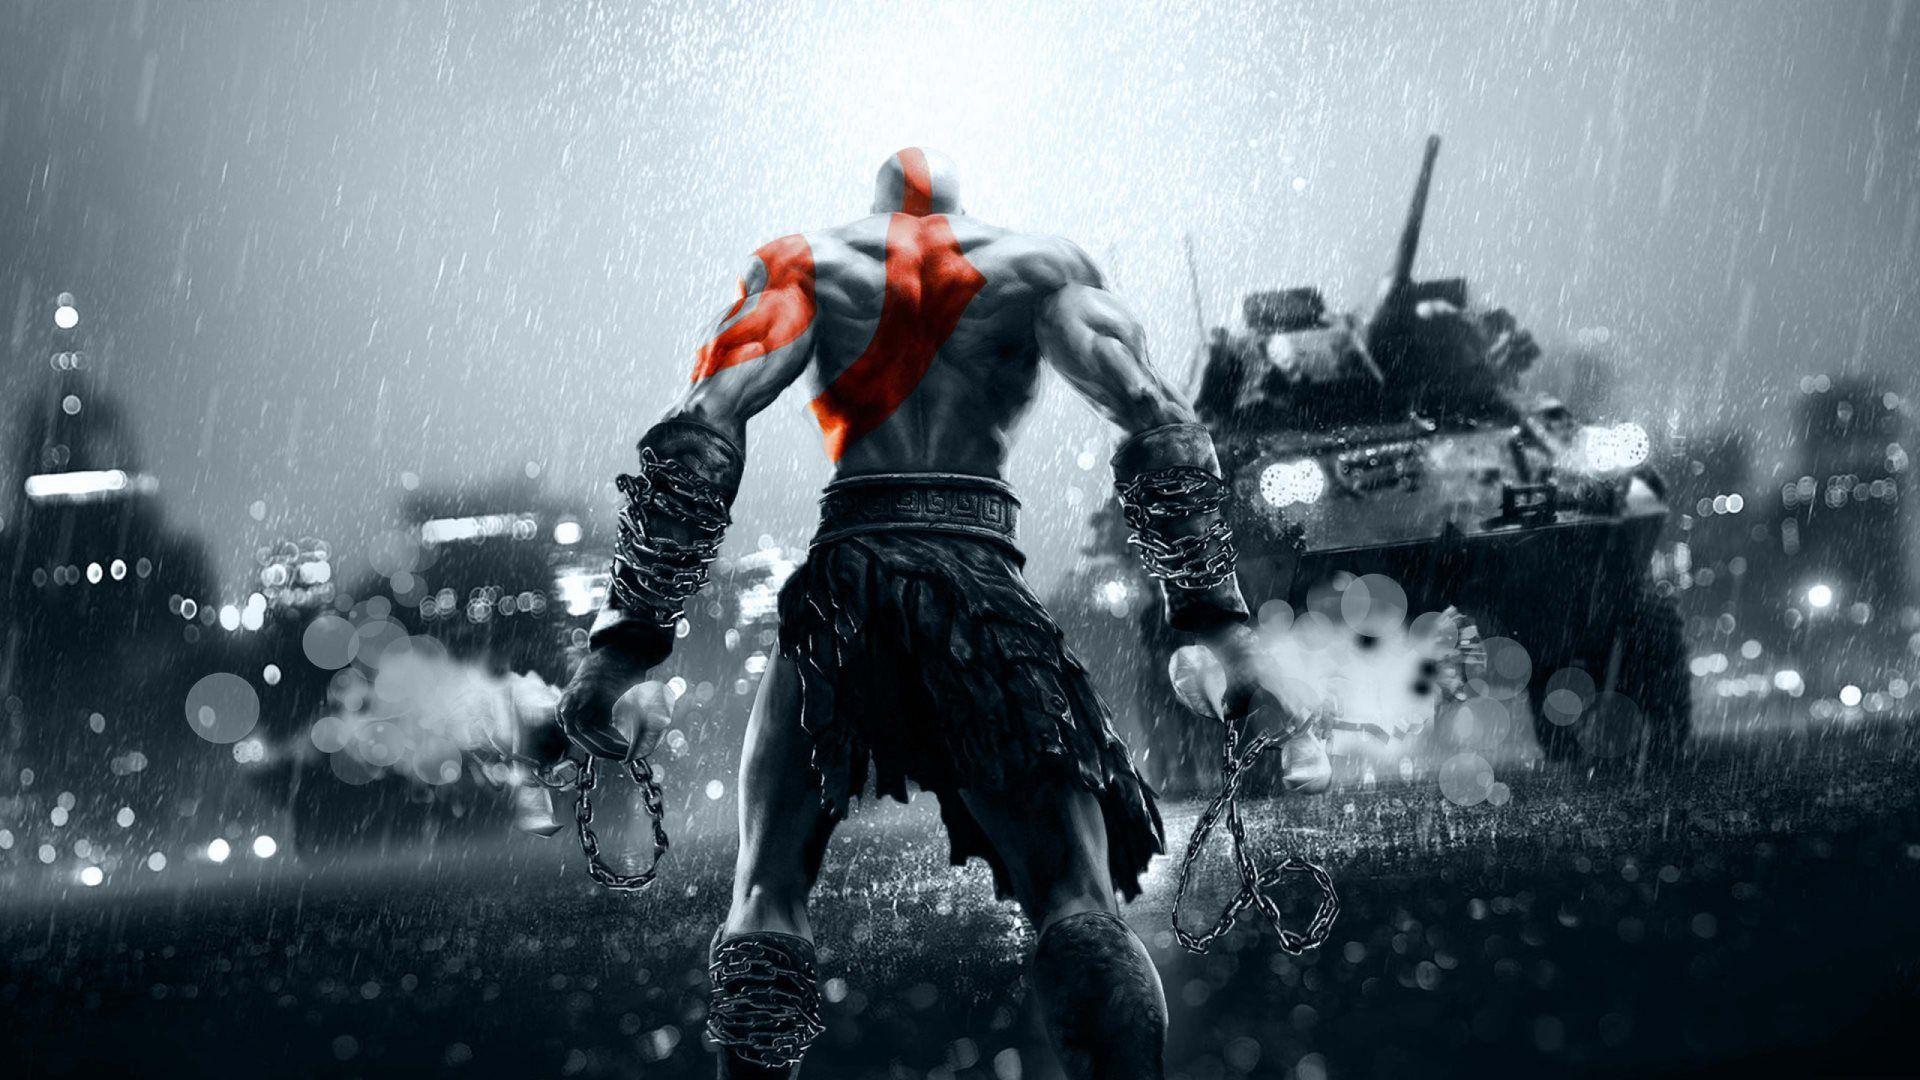 Pin On Gaming Illuminaughty High resolution ultra hd god of war